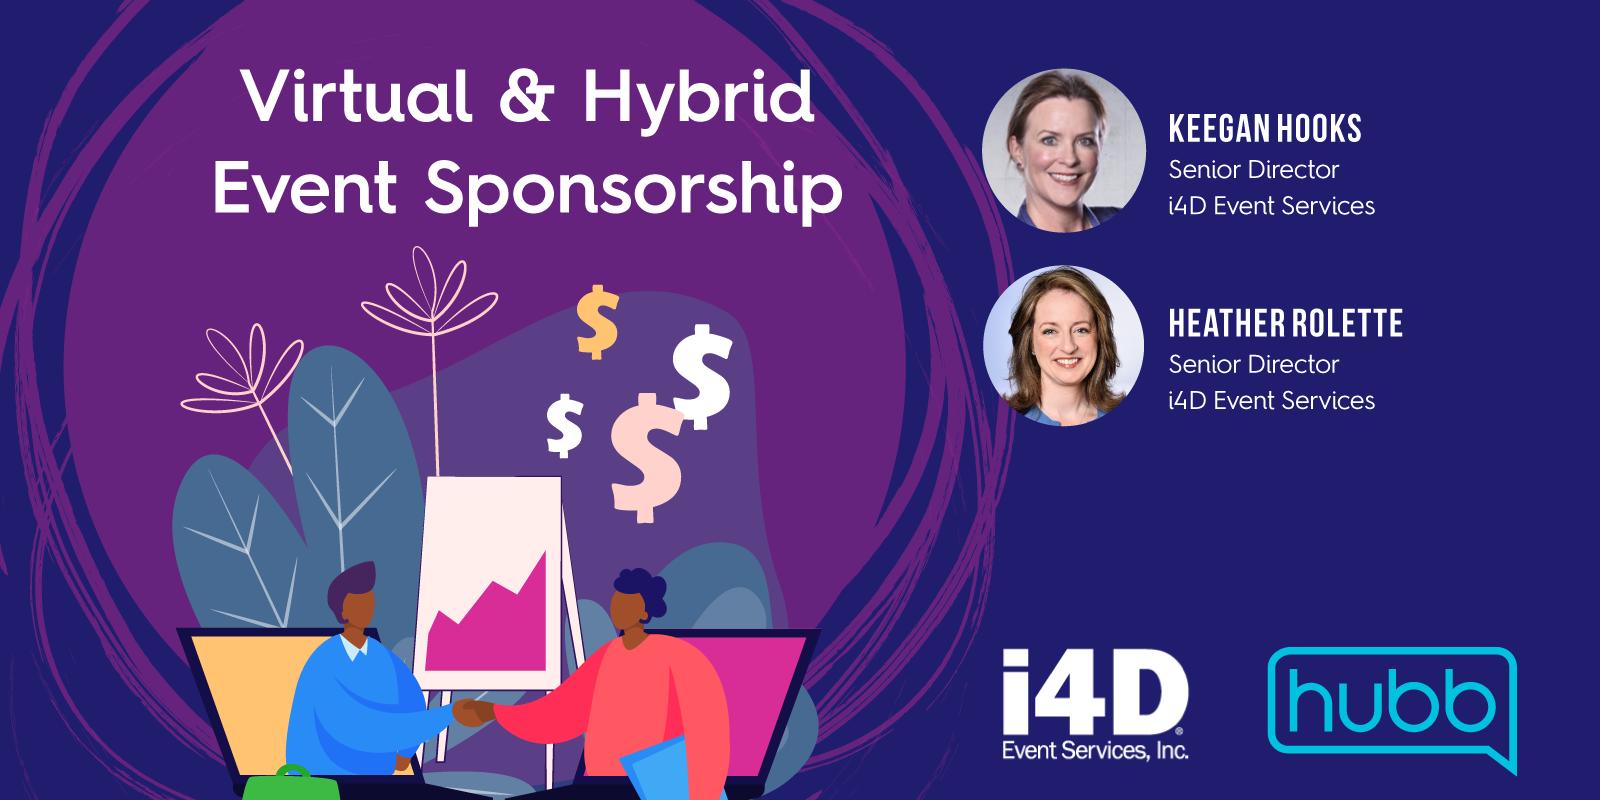 Virtual & Hybrid Event Sponsorship Webinar